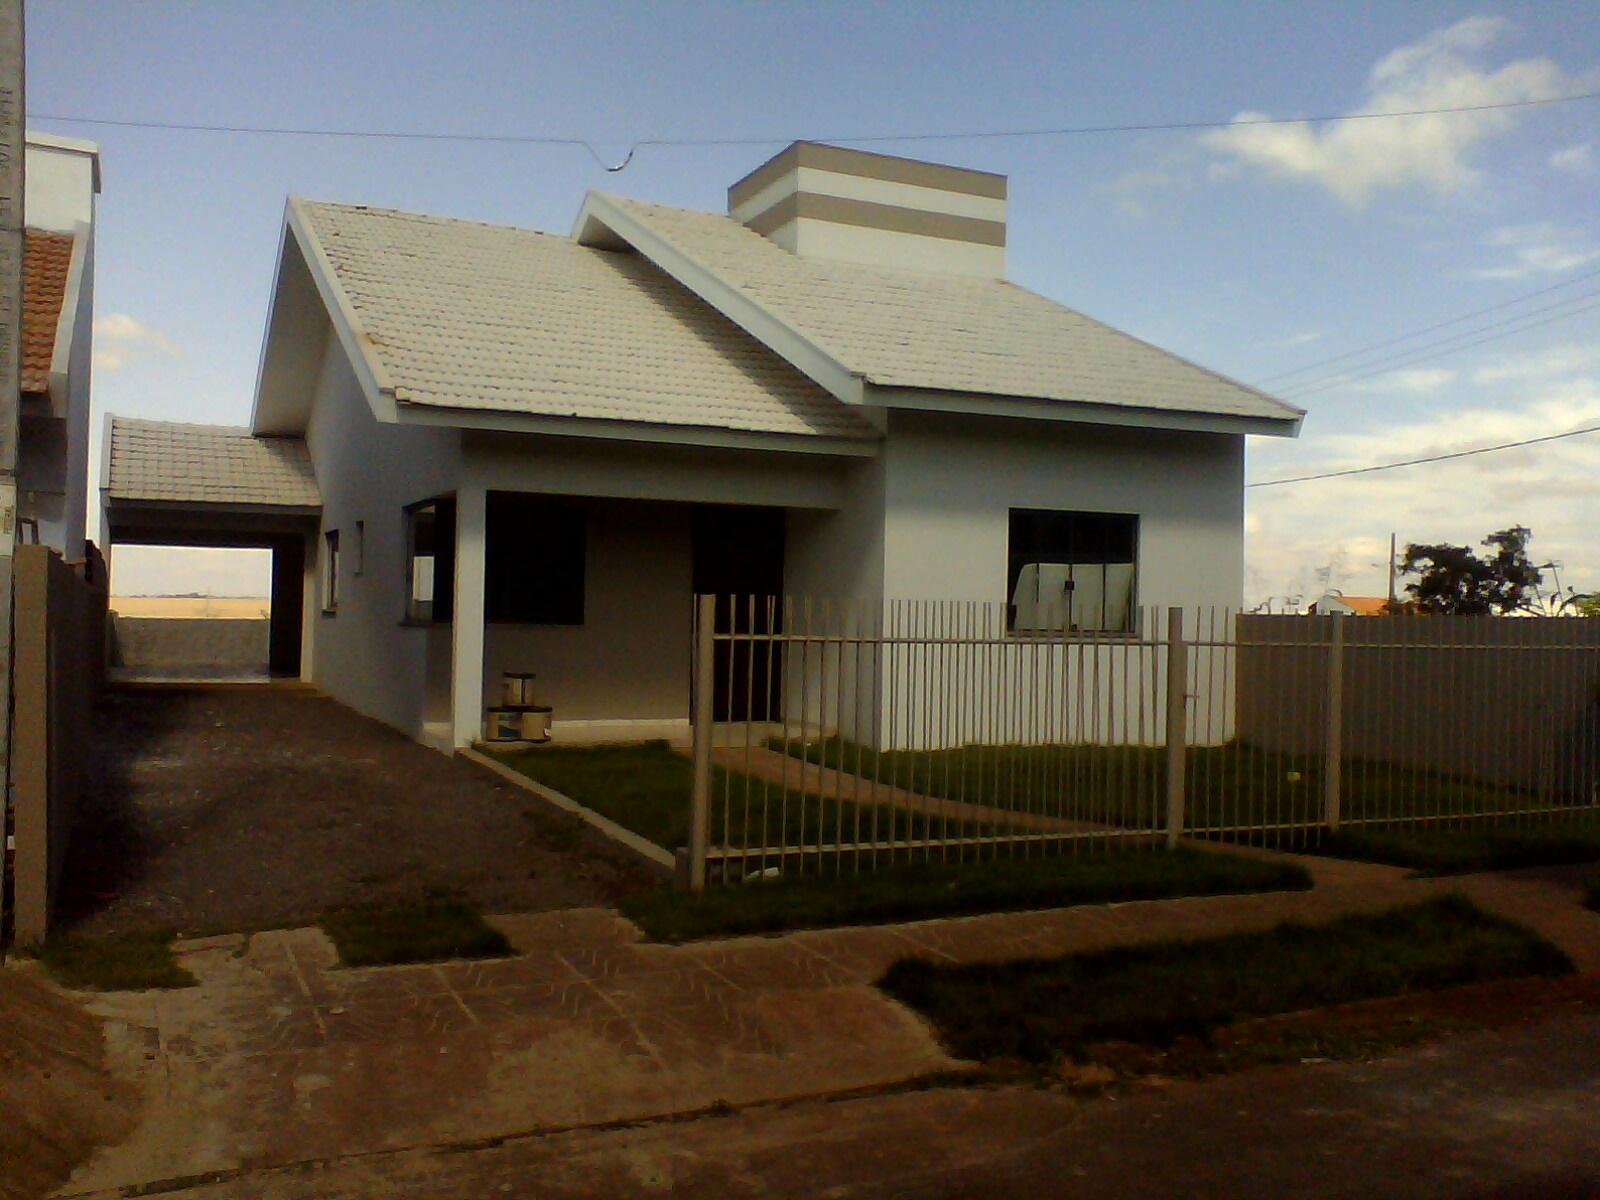 000 00 metragem 102 m2 de casa e 1300m2 de lote bairro jardim dallas #2E2010 1600 1200